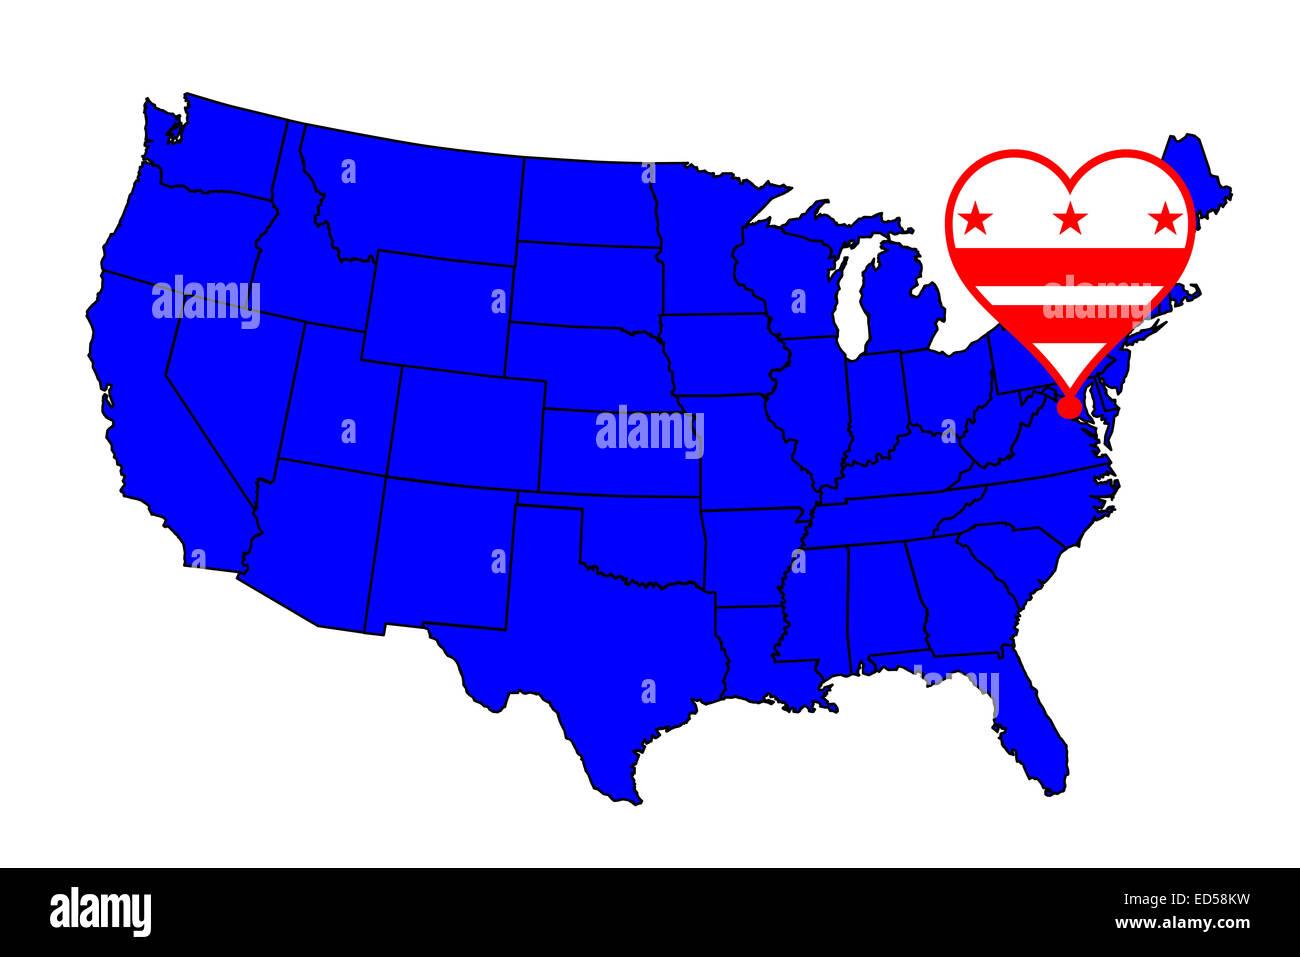 Dc State Map Stockfotos & Dc State Map Bilder - Alamy